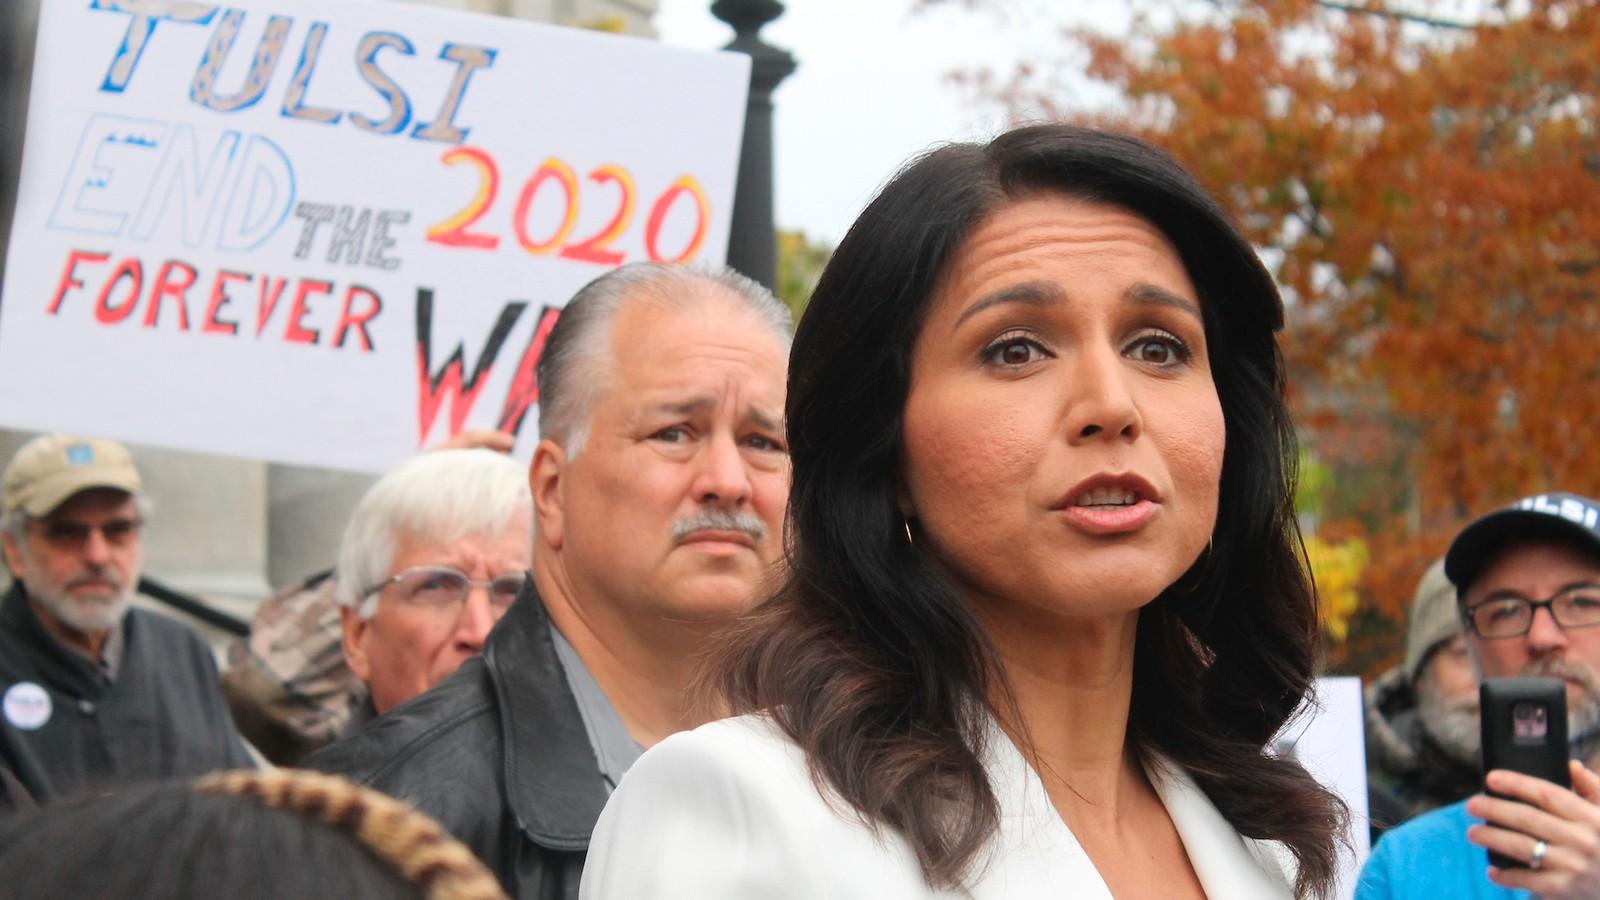 'I'm Full Tulsi': Inside Tulsi Gabbard's Wild Bid to Make Trouble in 2020